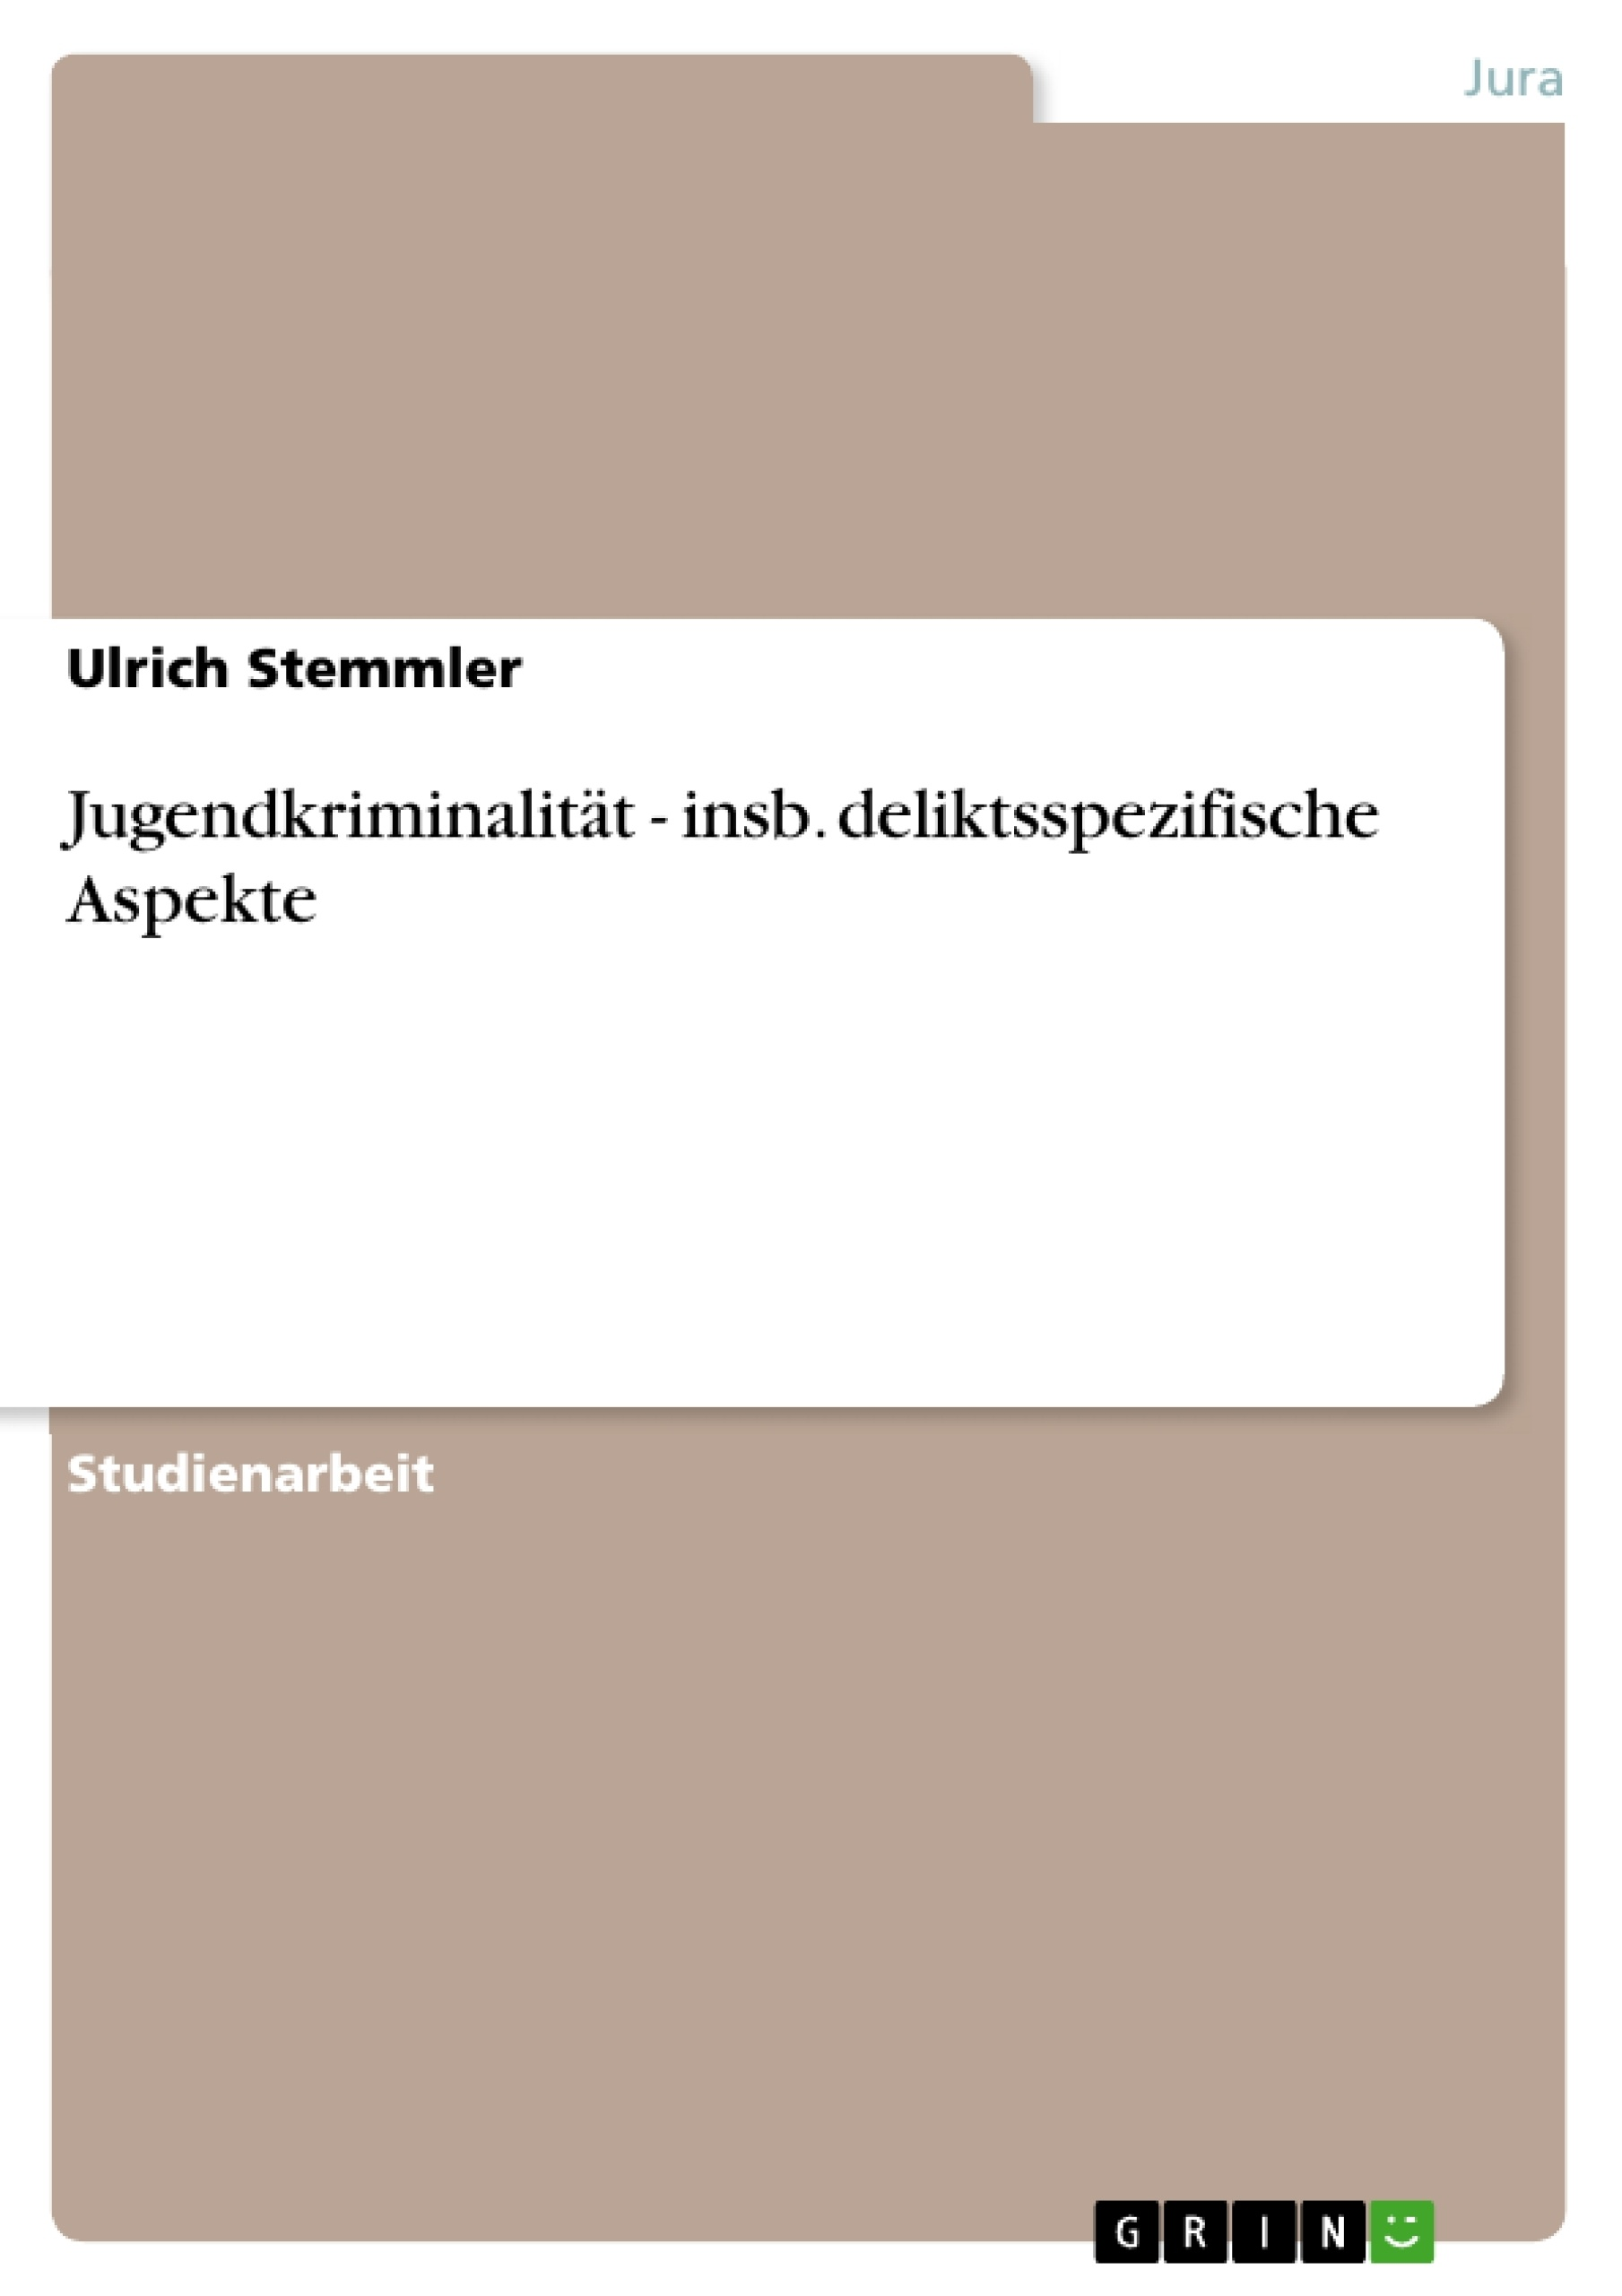 Titel: Jugendkriminalität - insb. deliktsspezifische Aspekte